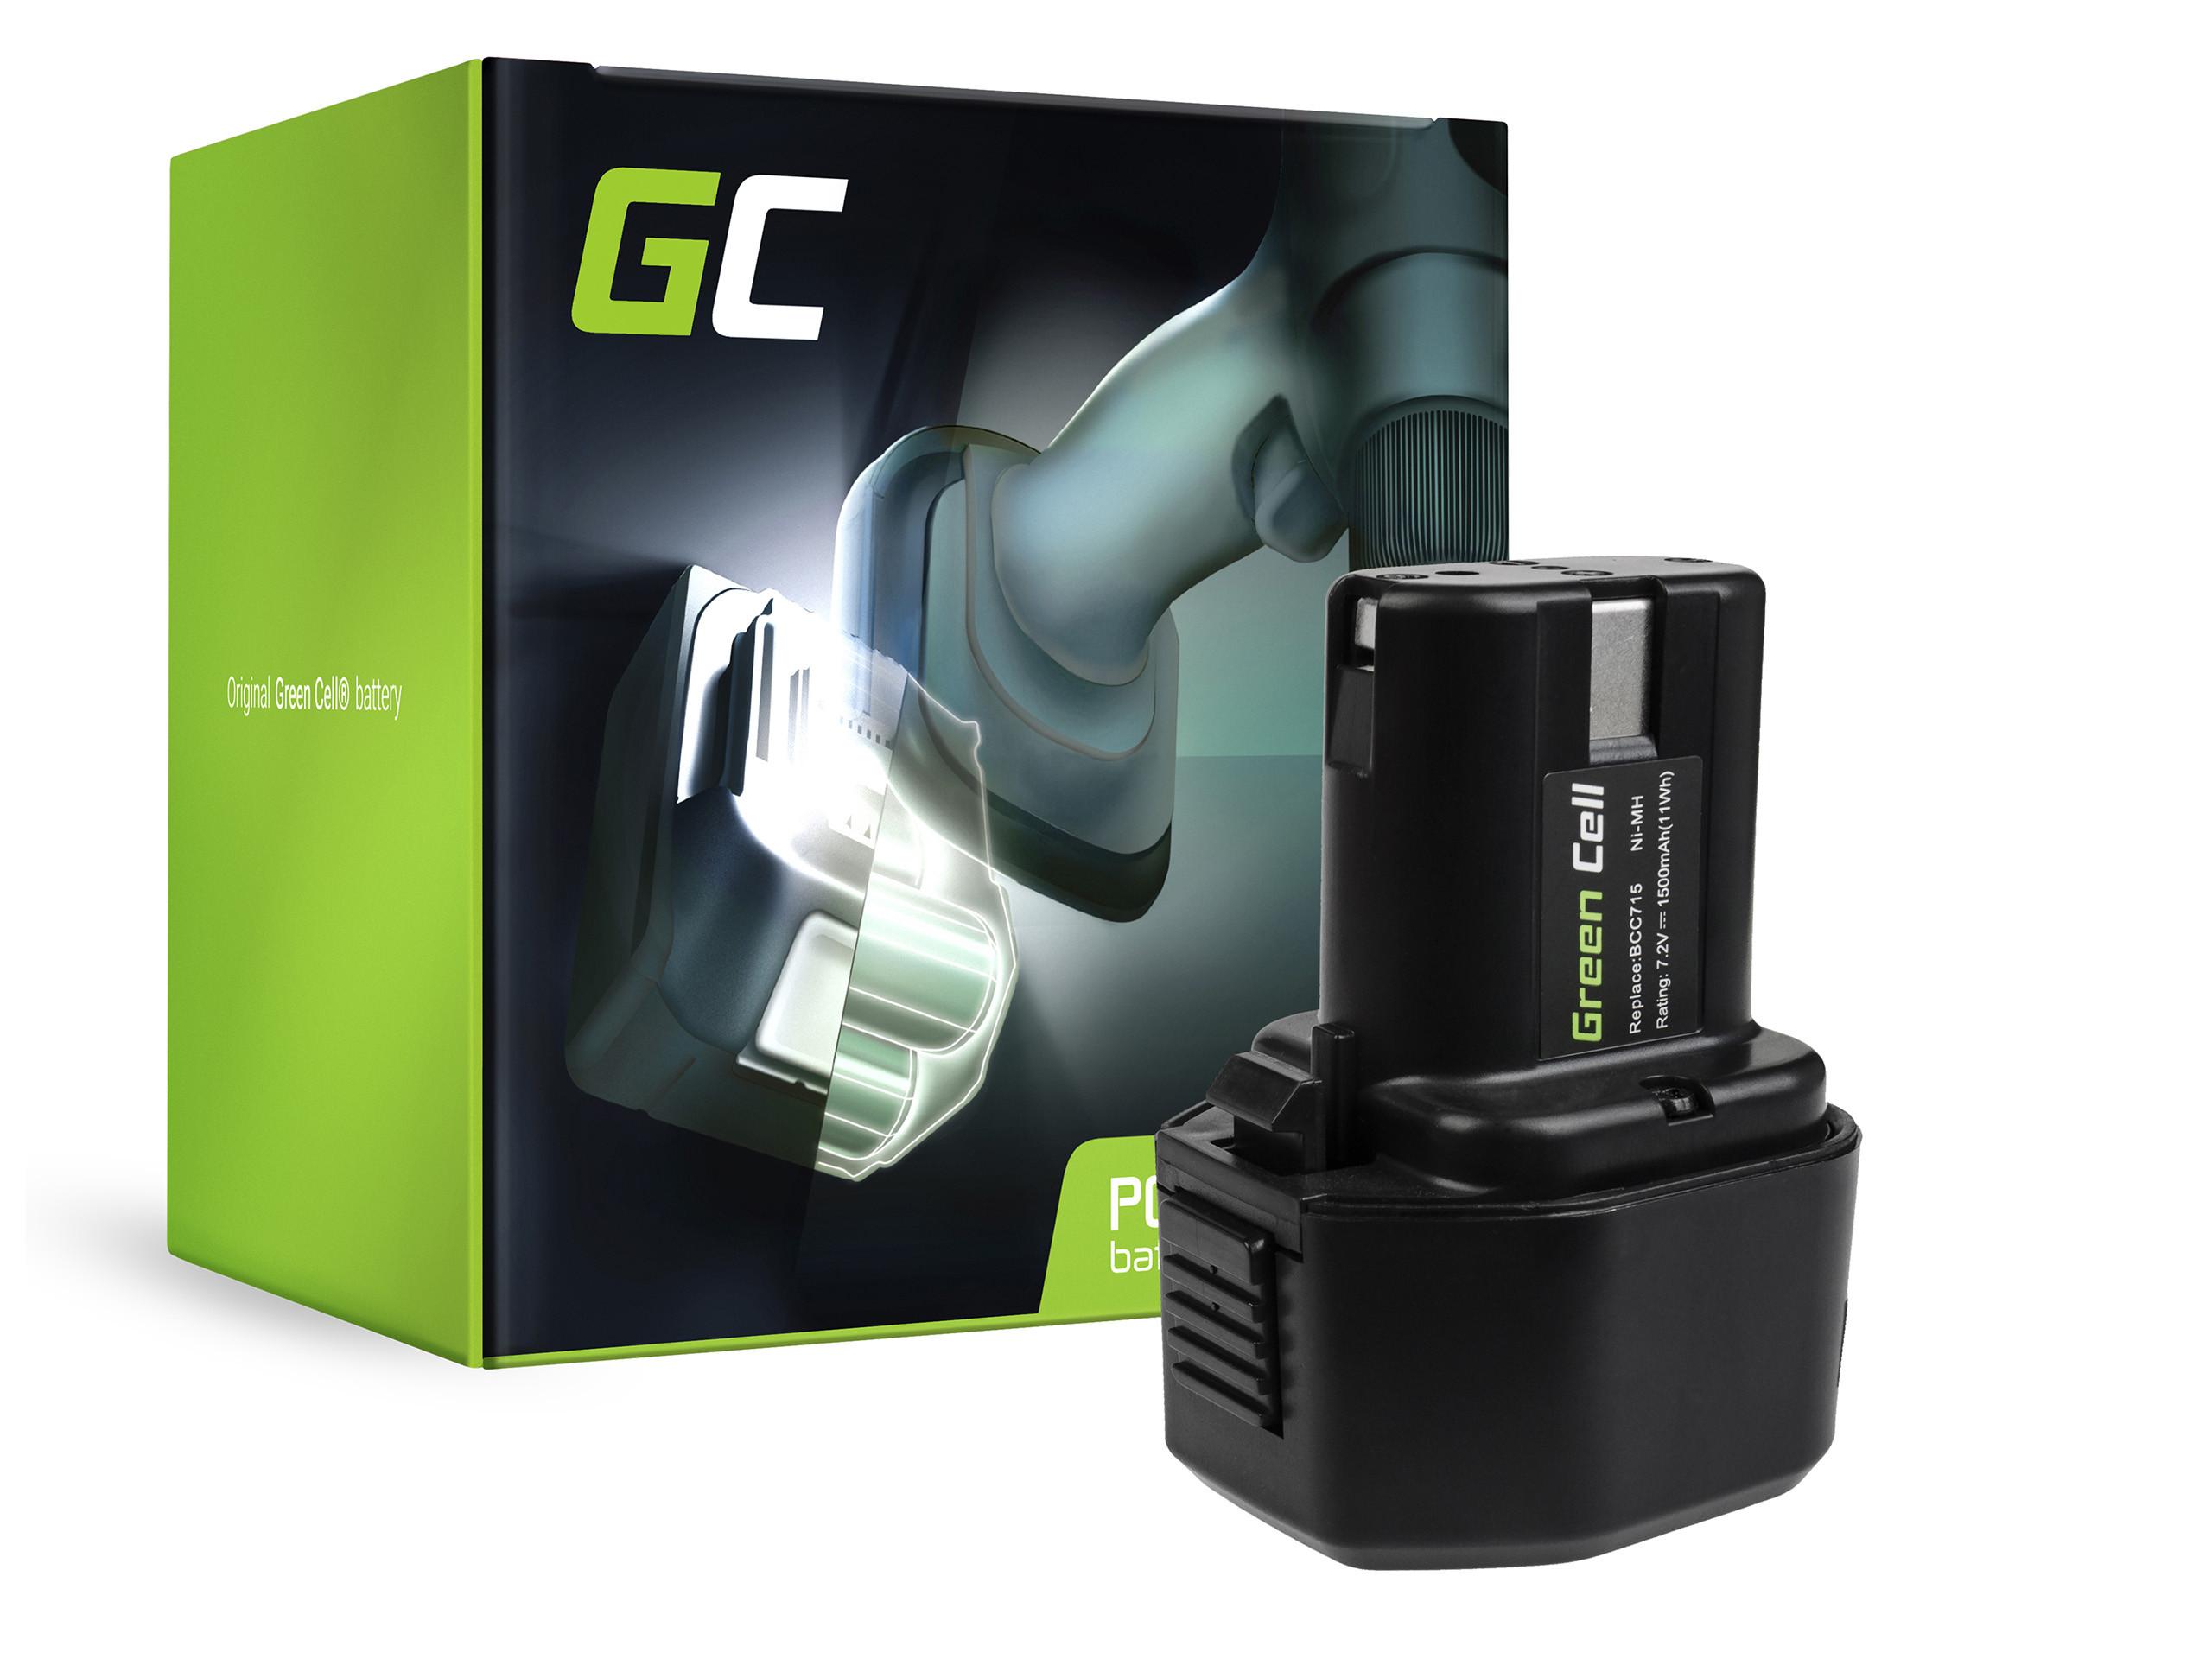 Green Cell Power Tool Battery 7.2V 1.5Ah BCC715 EB712S EB714S EB7 for Hitachi NR90GC NR90GR